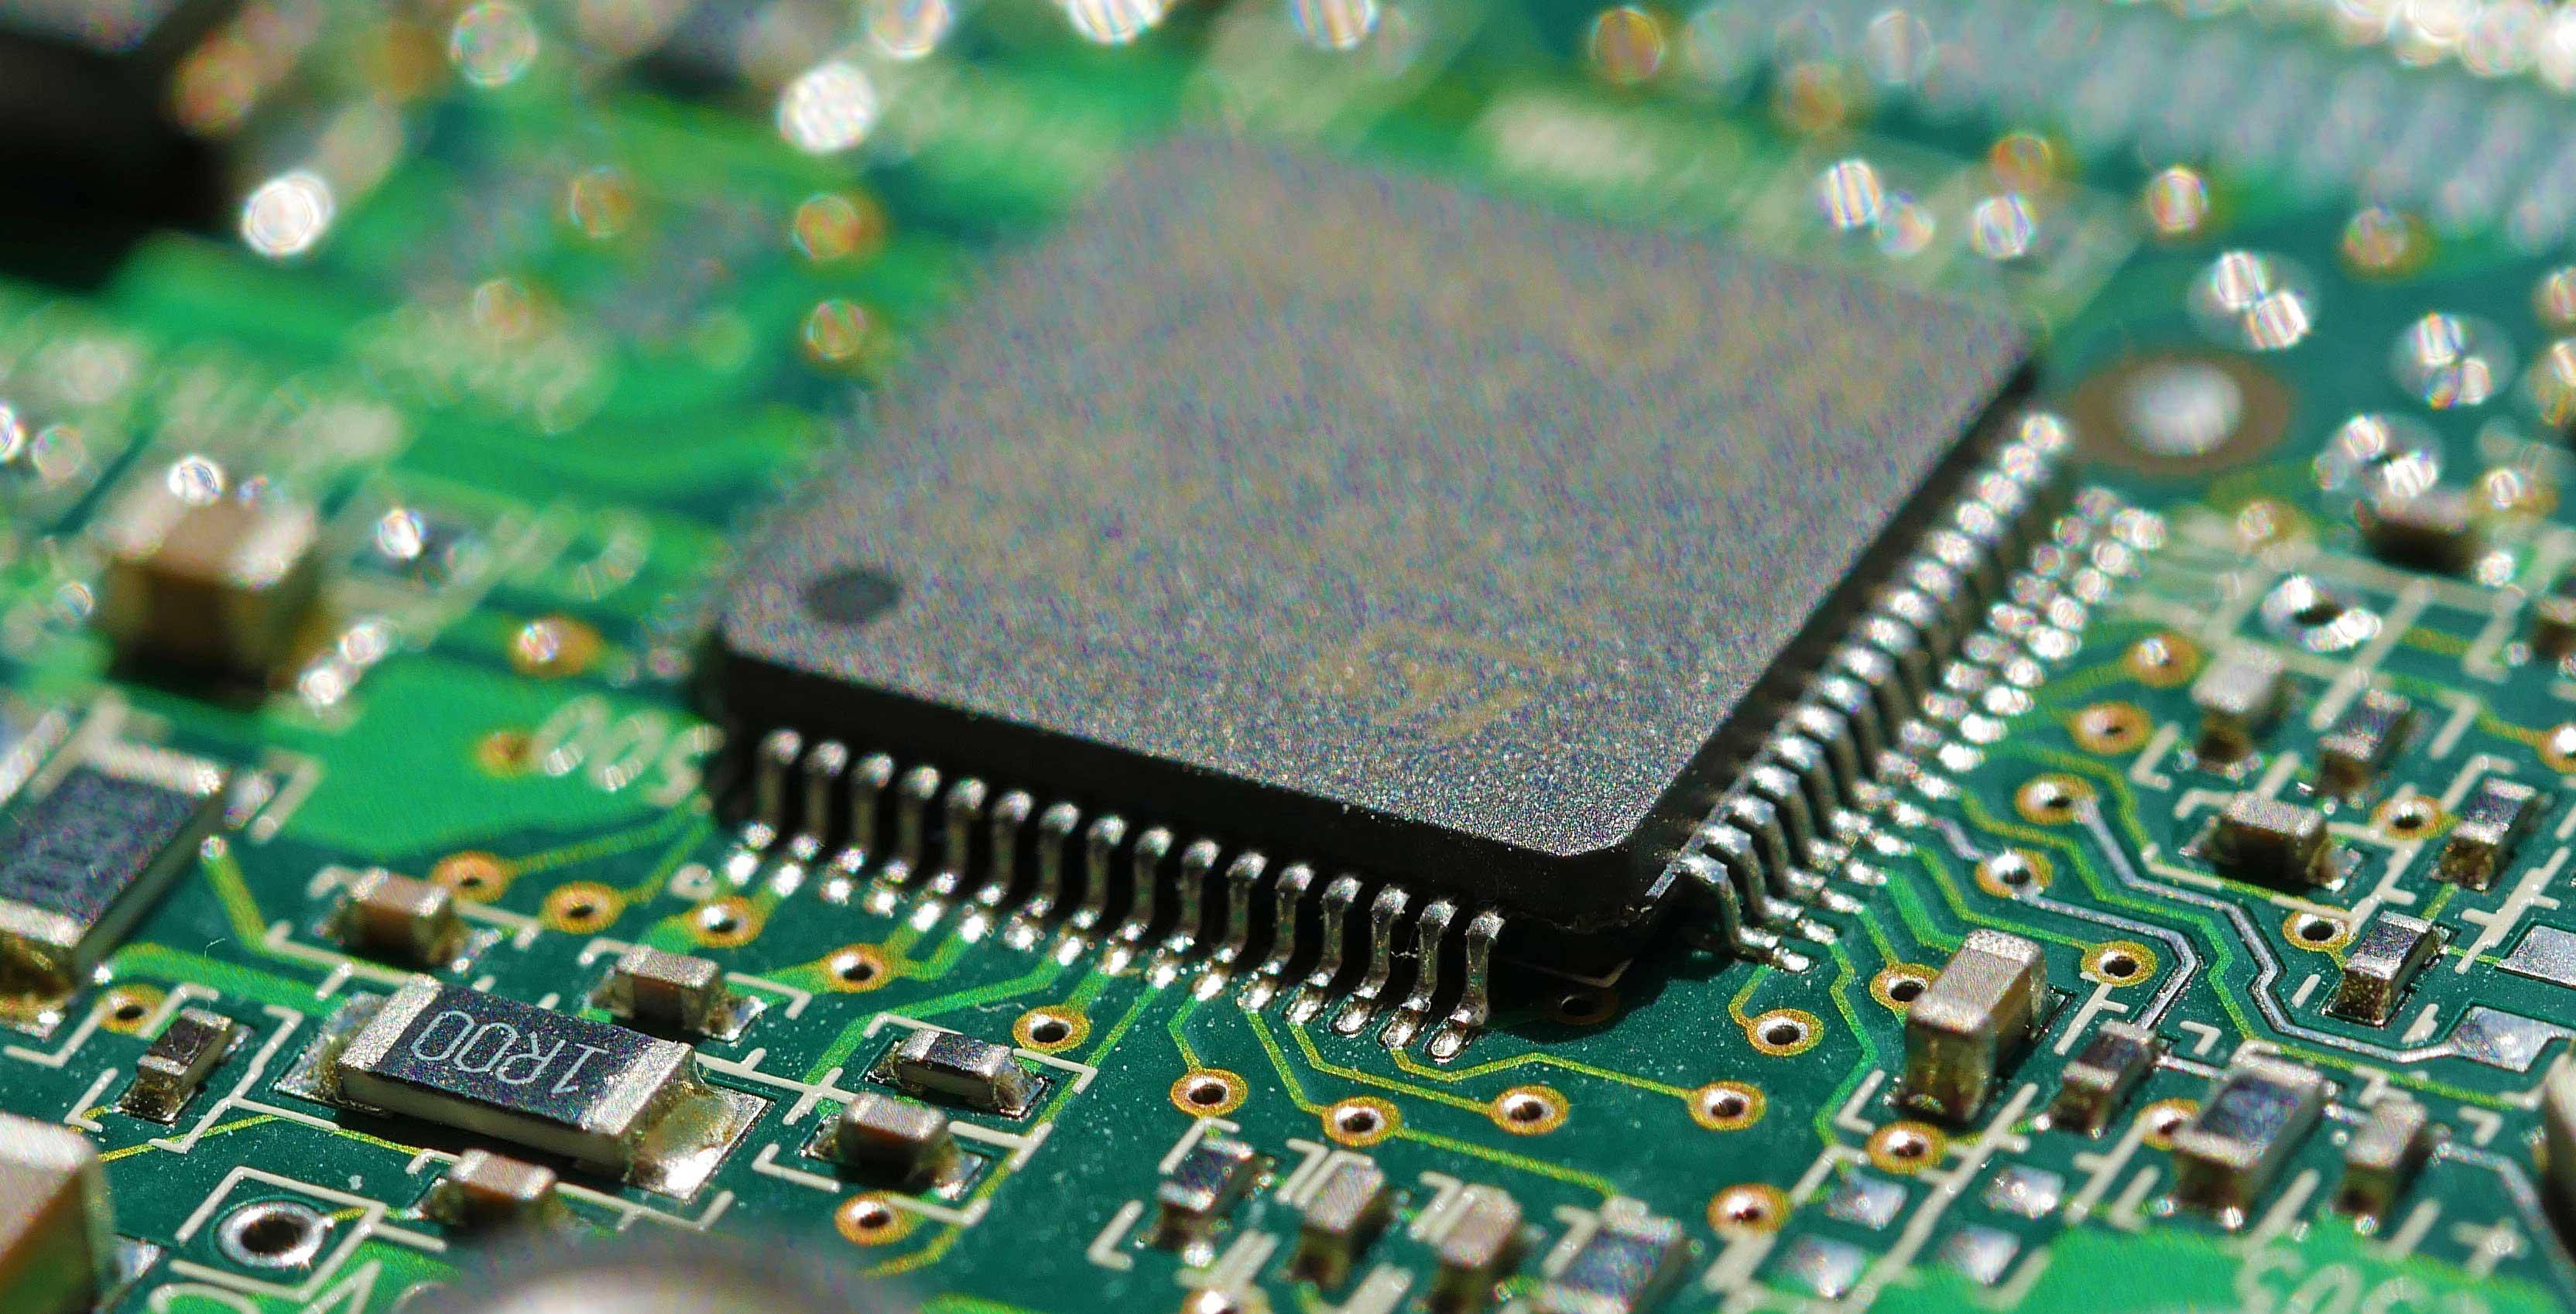 An image of a microchip